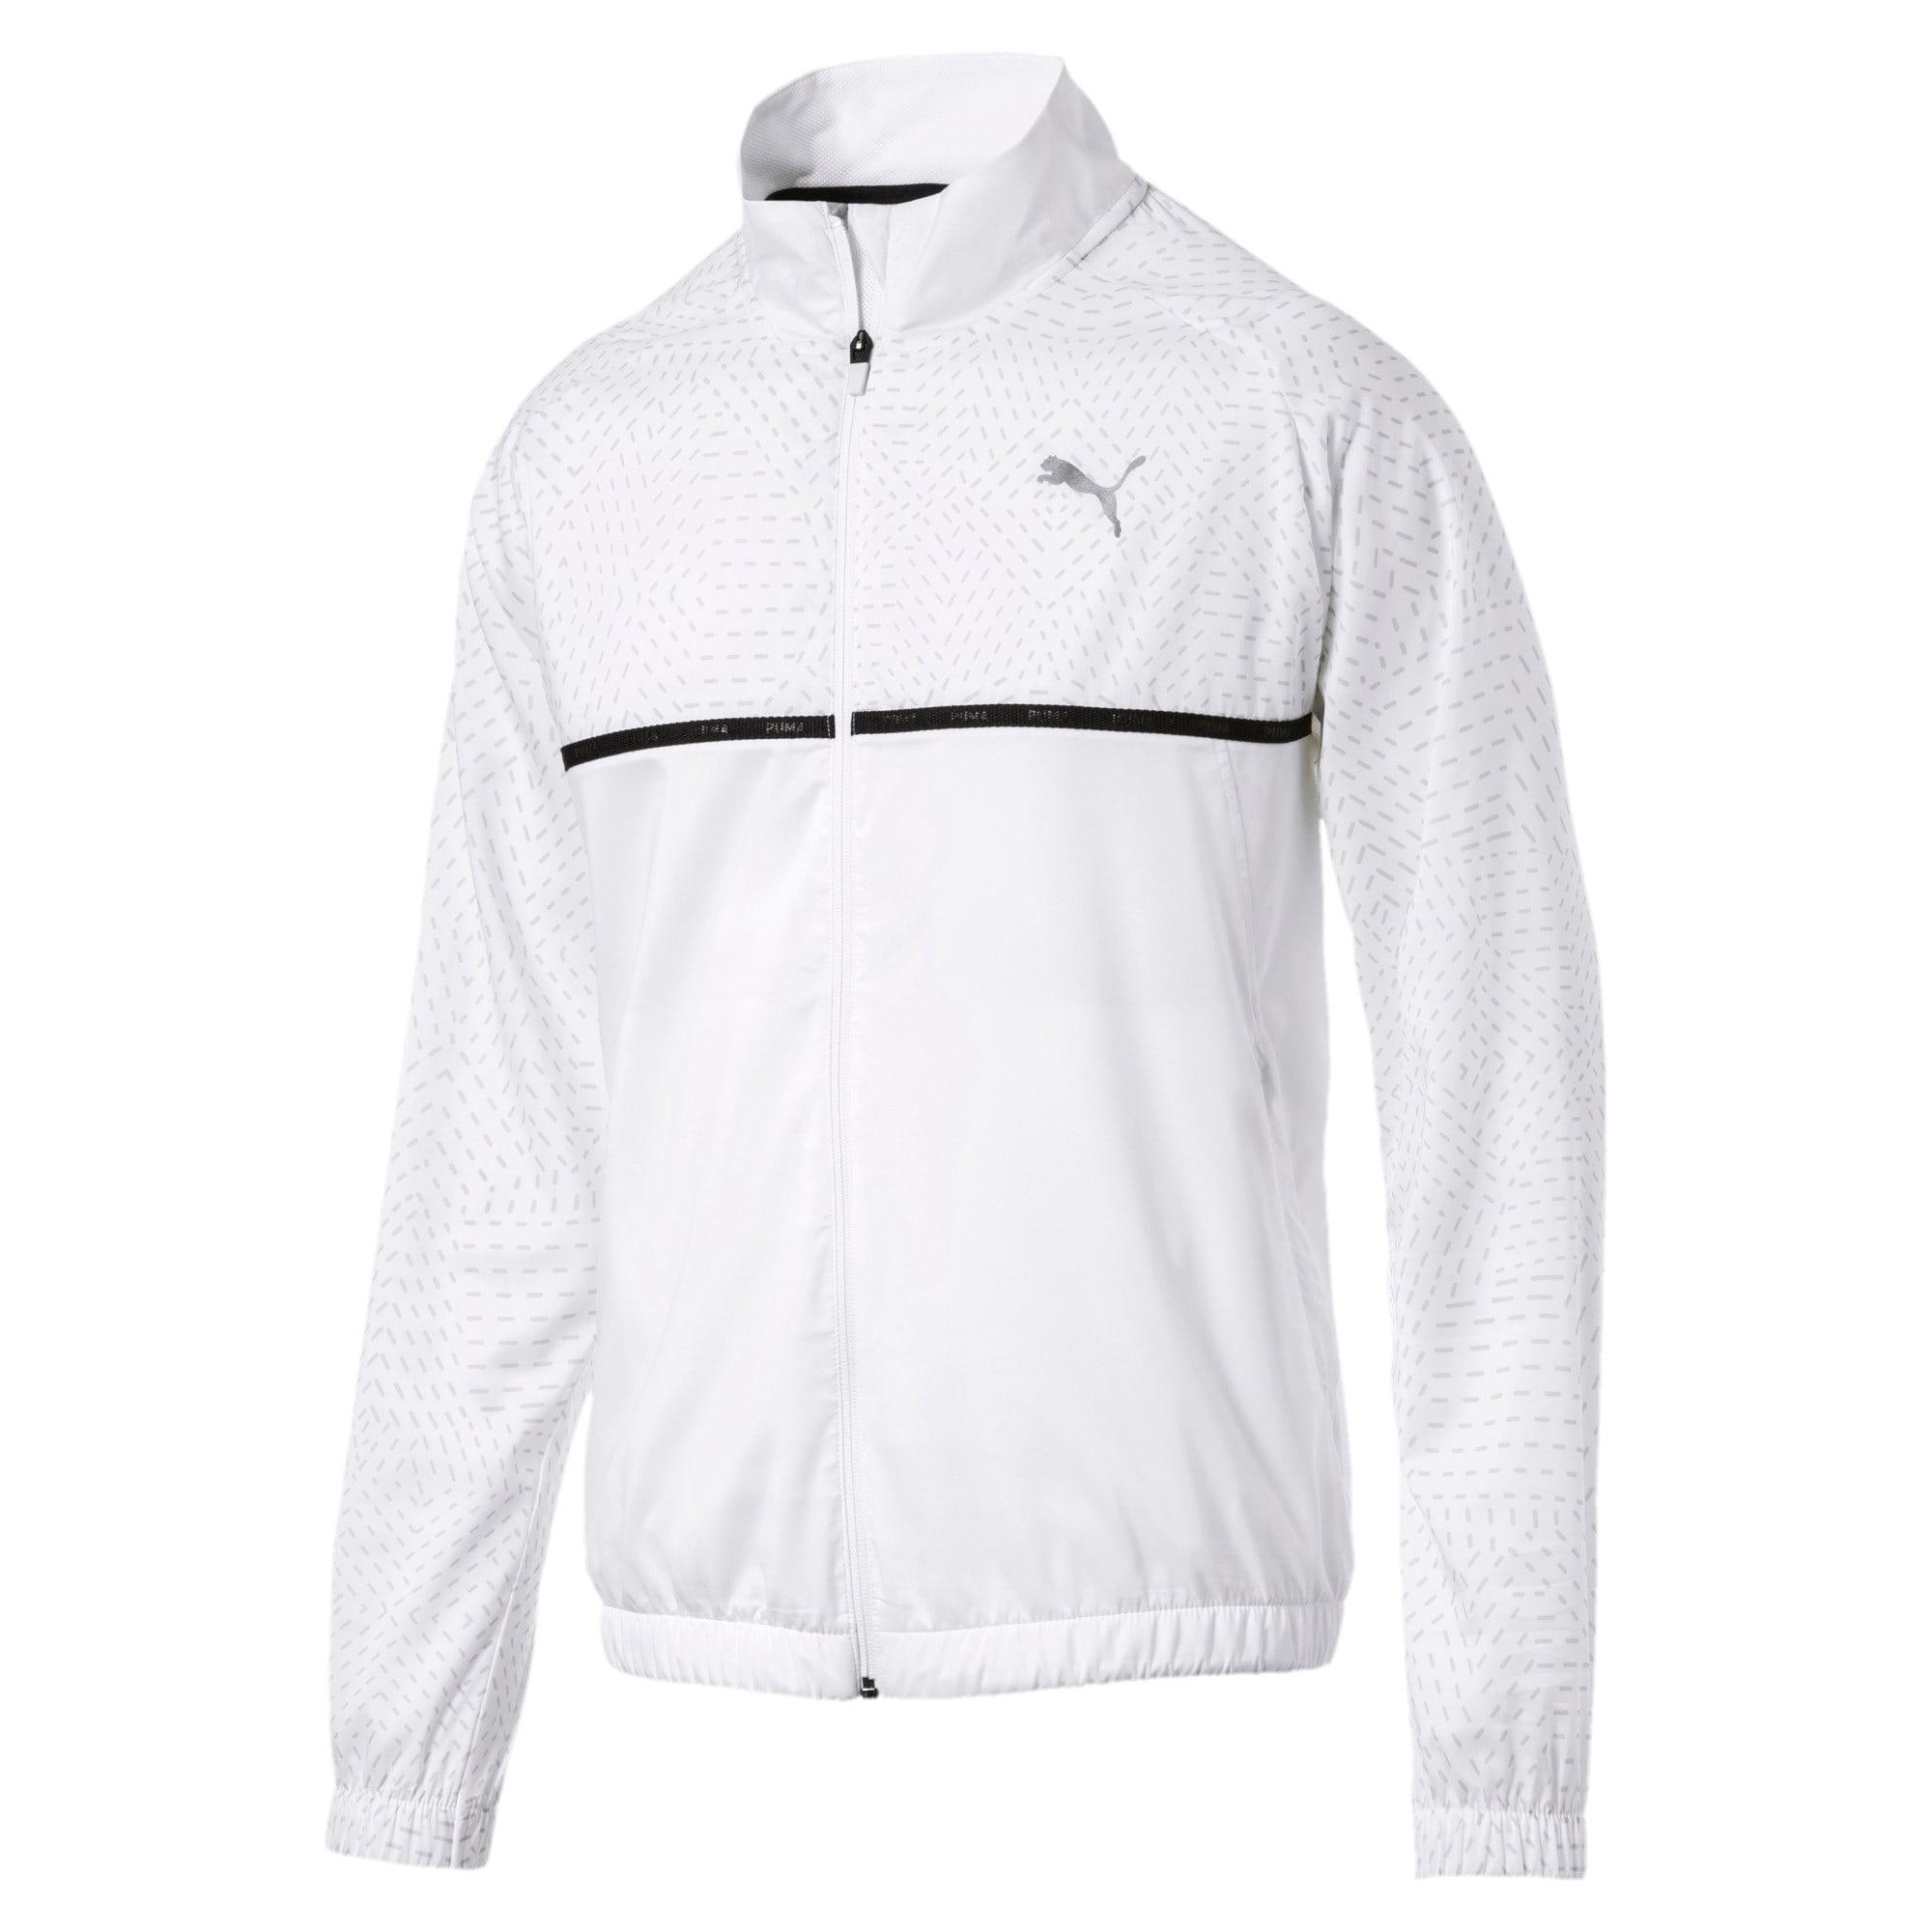 Thumbnail 1 of Energy Woven Men's Sweat Jacket, Puma White, medium